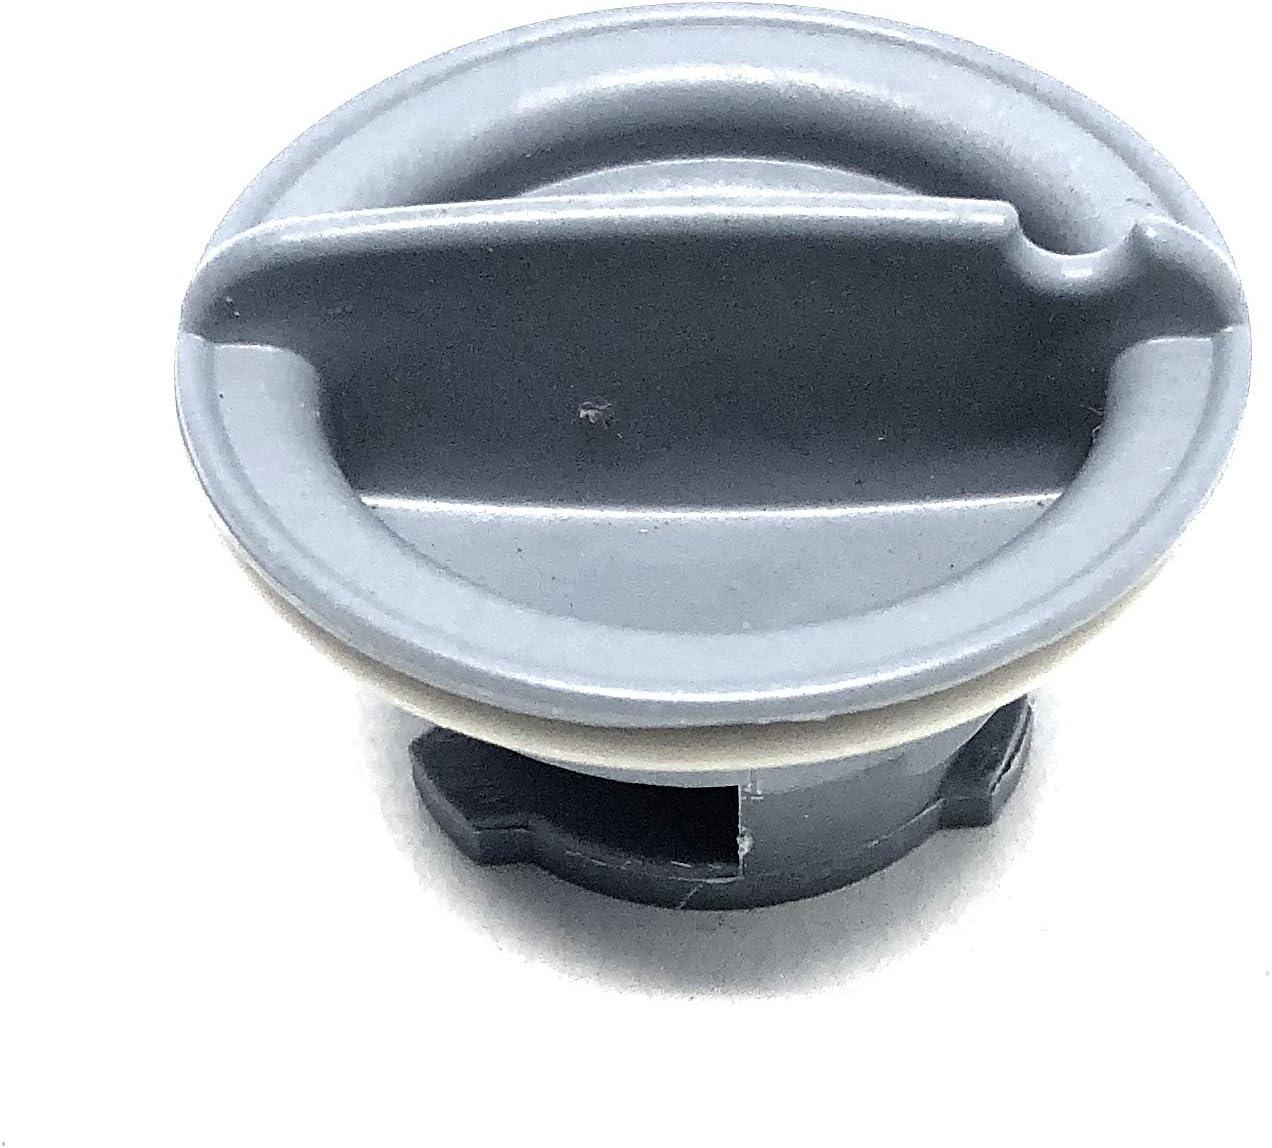 Details about  /Dishwasher Water Dispenser Cap 8558307 For Whirlpool KitchenAid 577 KUDP02CRB52